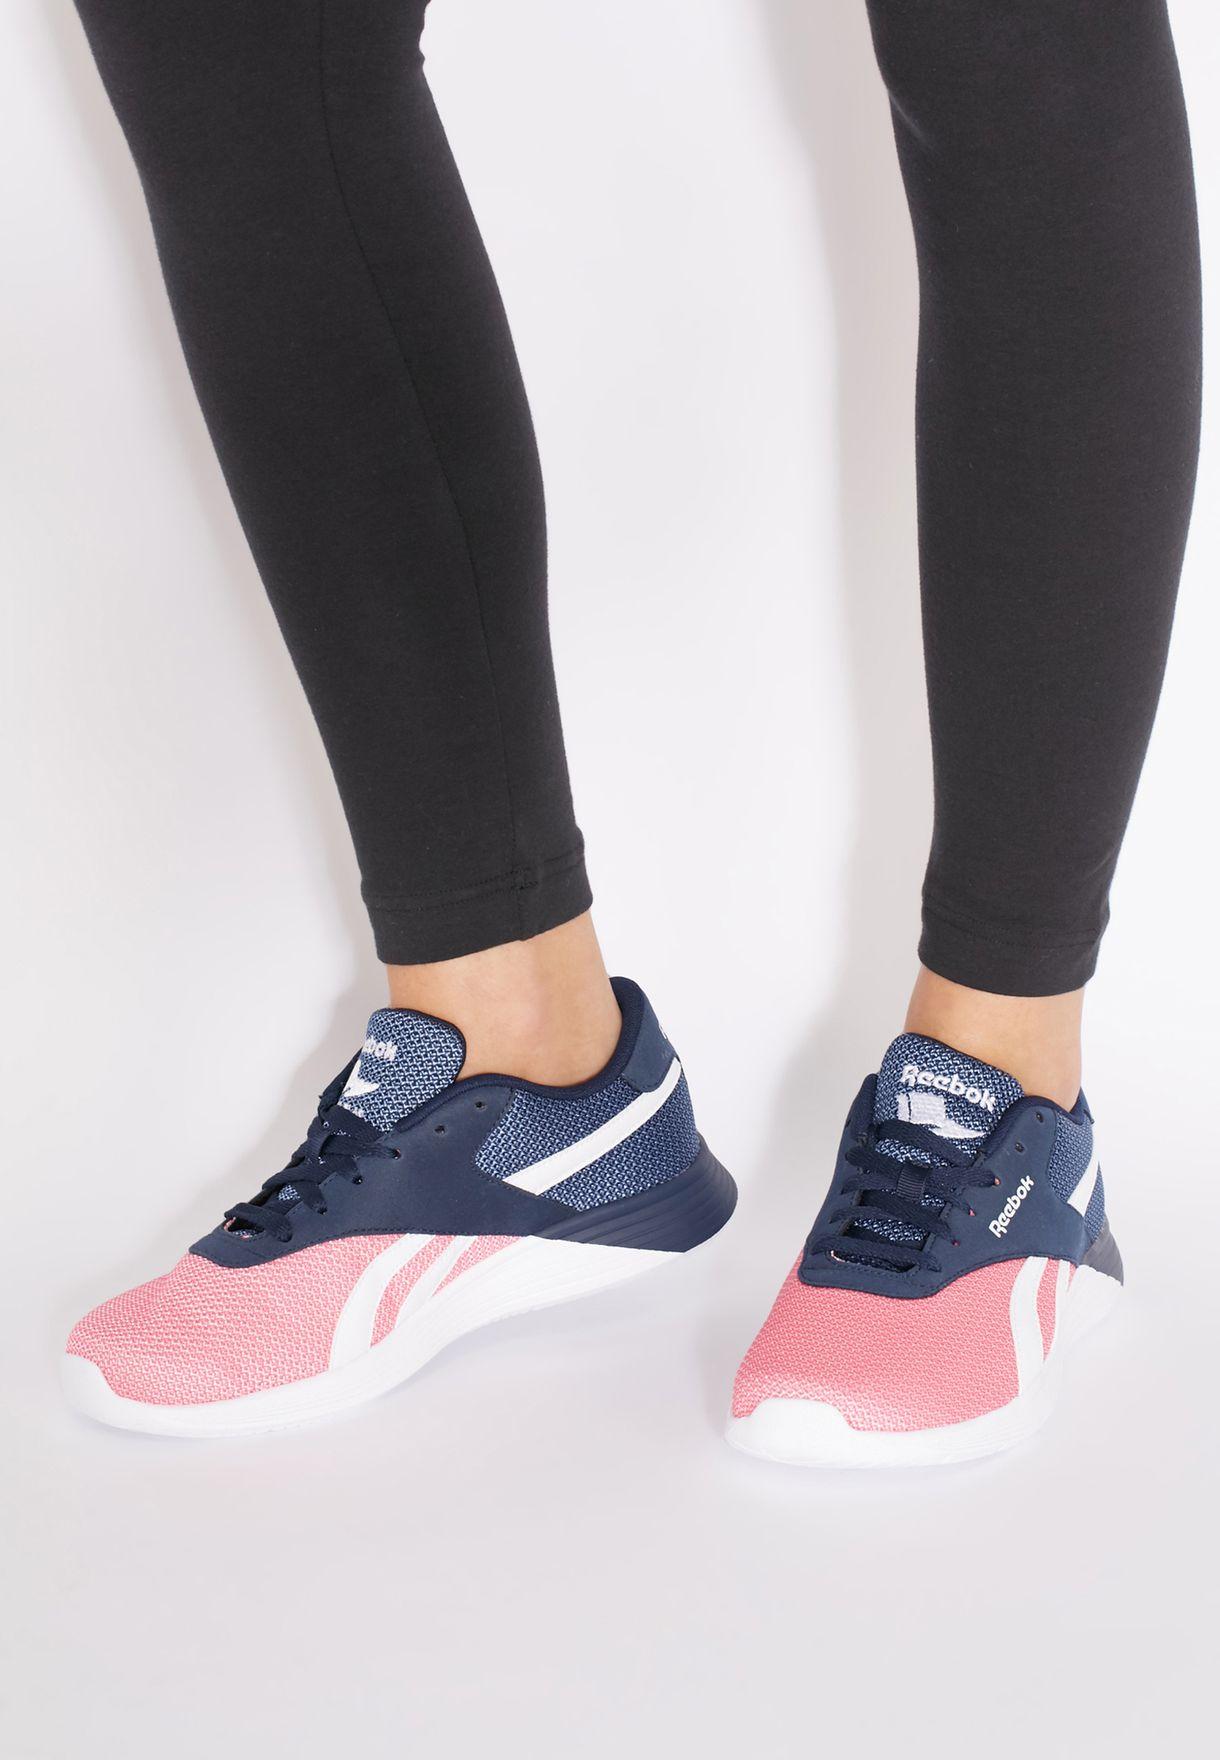 Womens Reebok Royal EC Ride FS Trainers MemoryTech Violet \ Pink UK Size 6.5 NEW